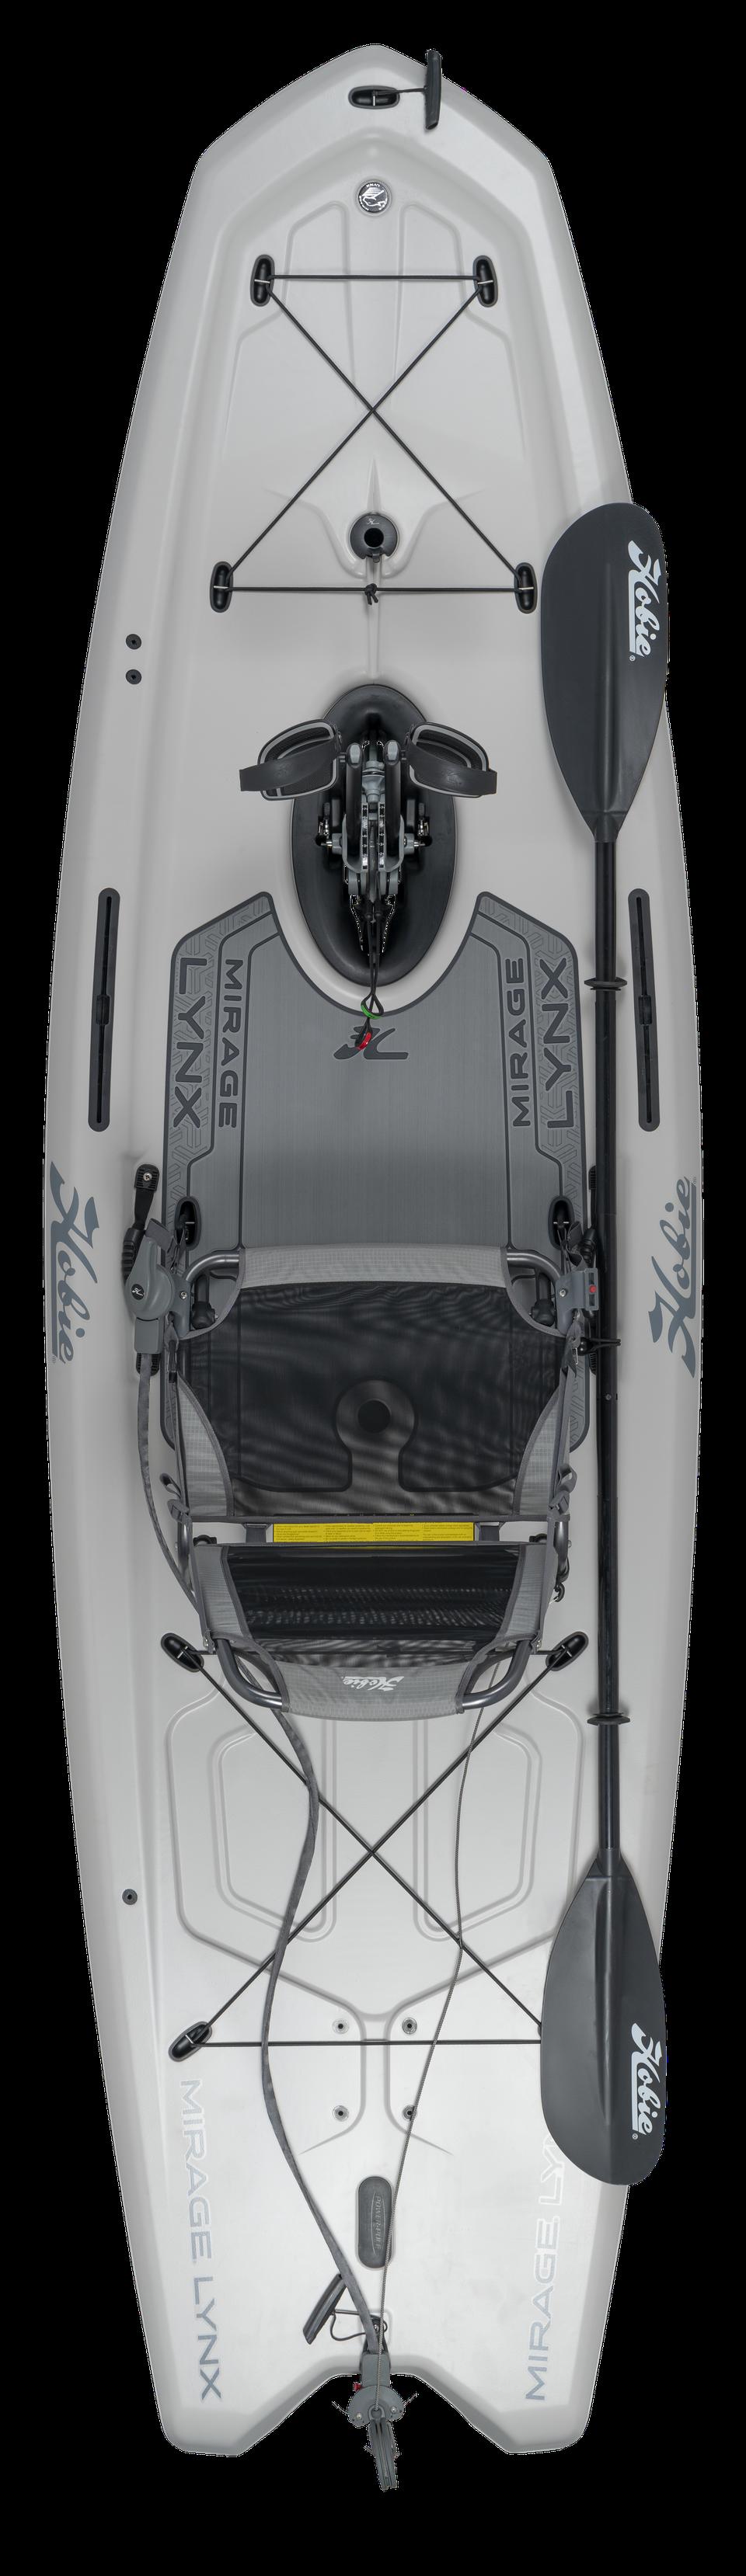 Mirage Lynx Product Image